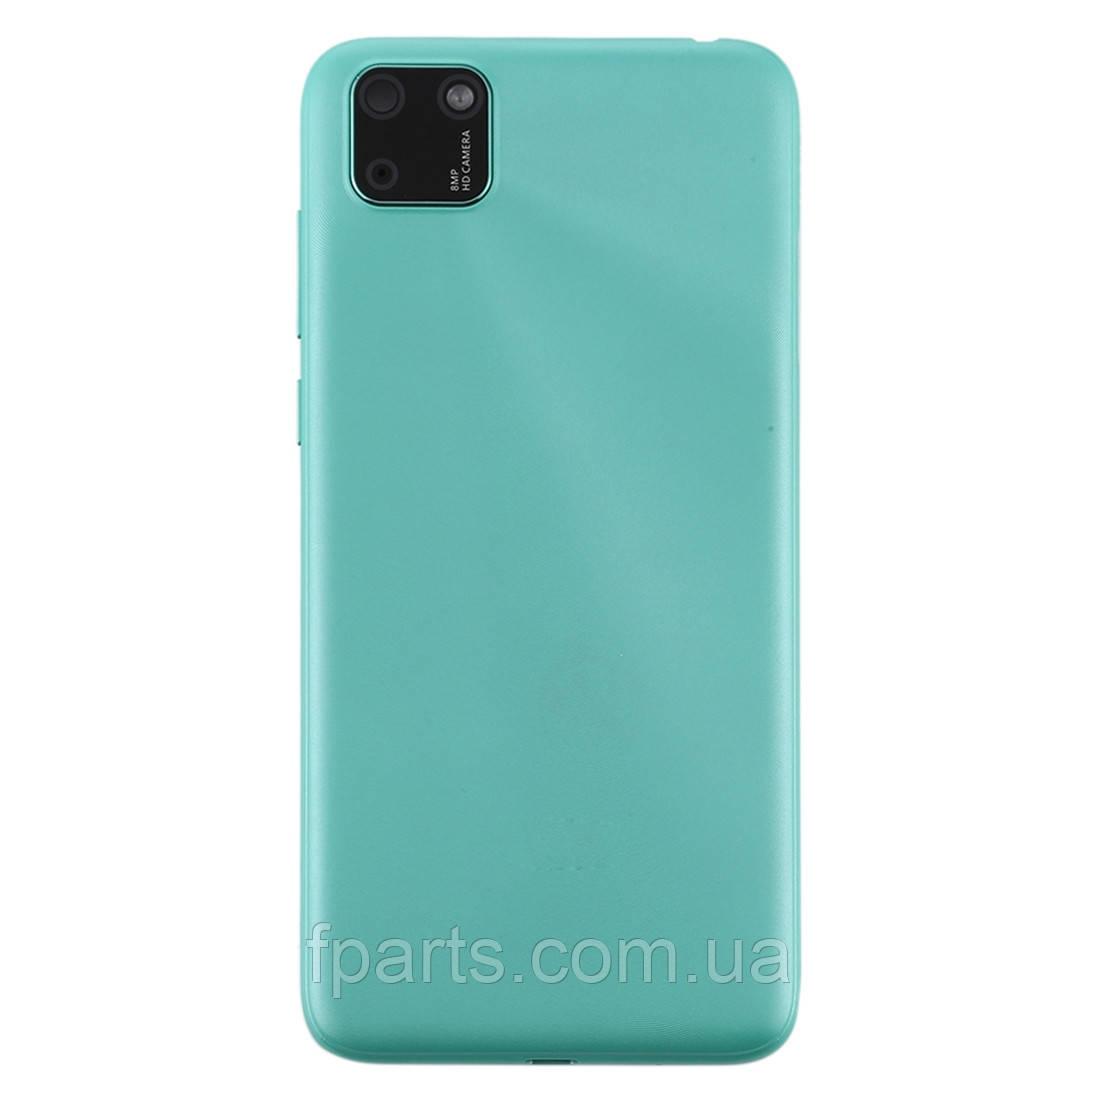 Задня кришка Huawei Y5P 2020 (DRA-LX1) Green